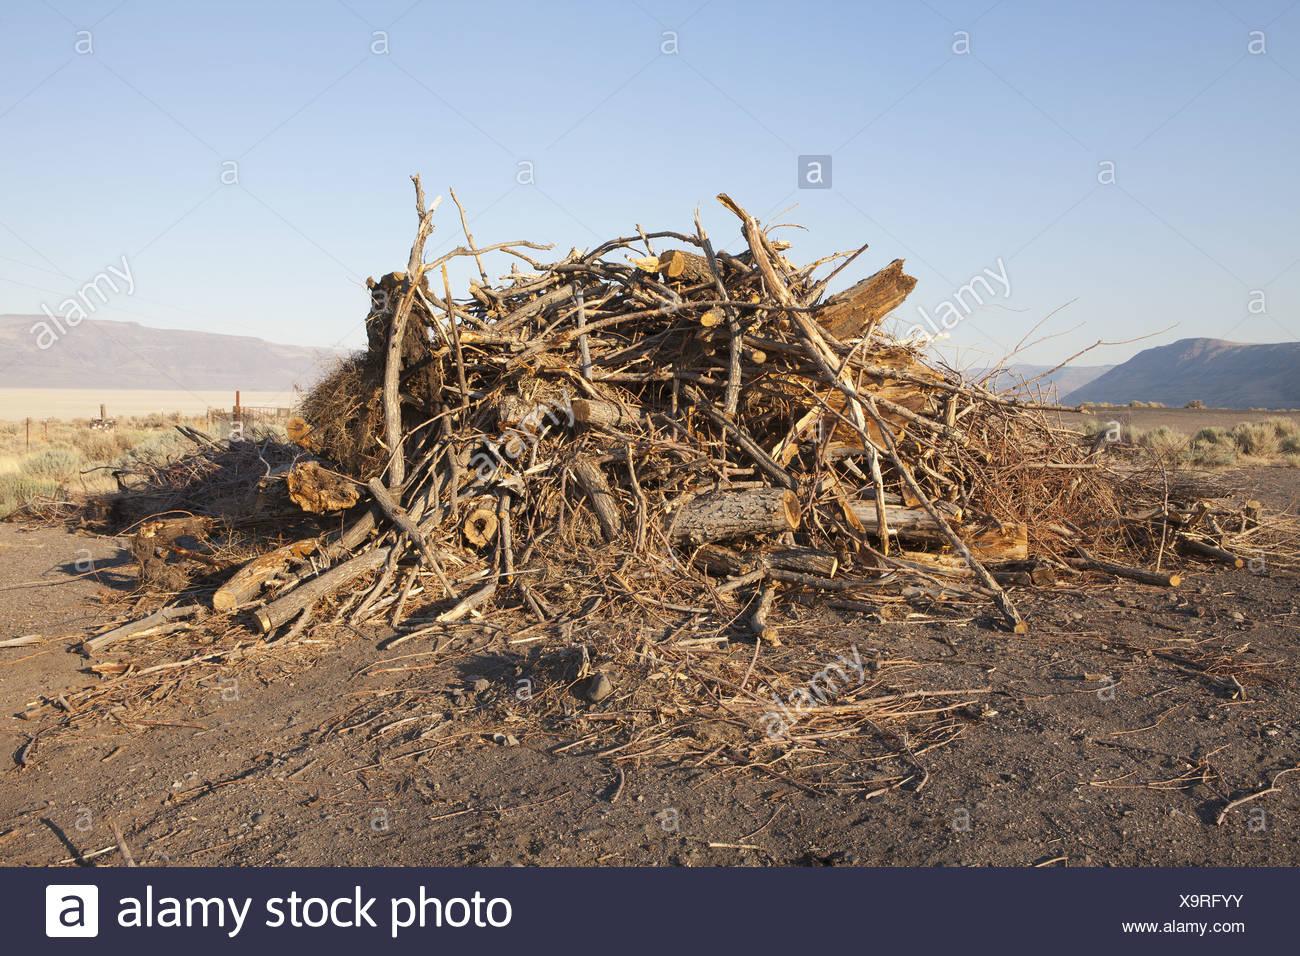 Nevada USA pile of wood debris and shavings - Stock Image